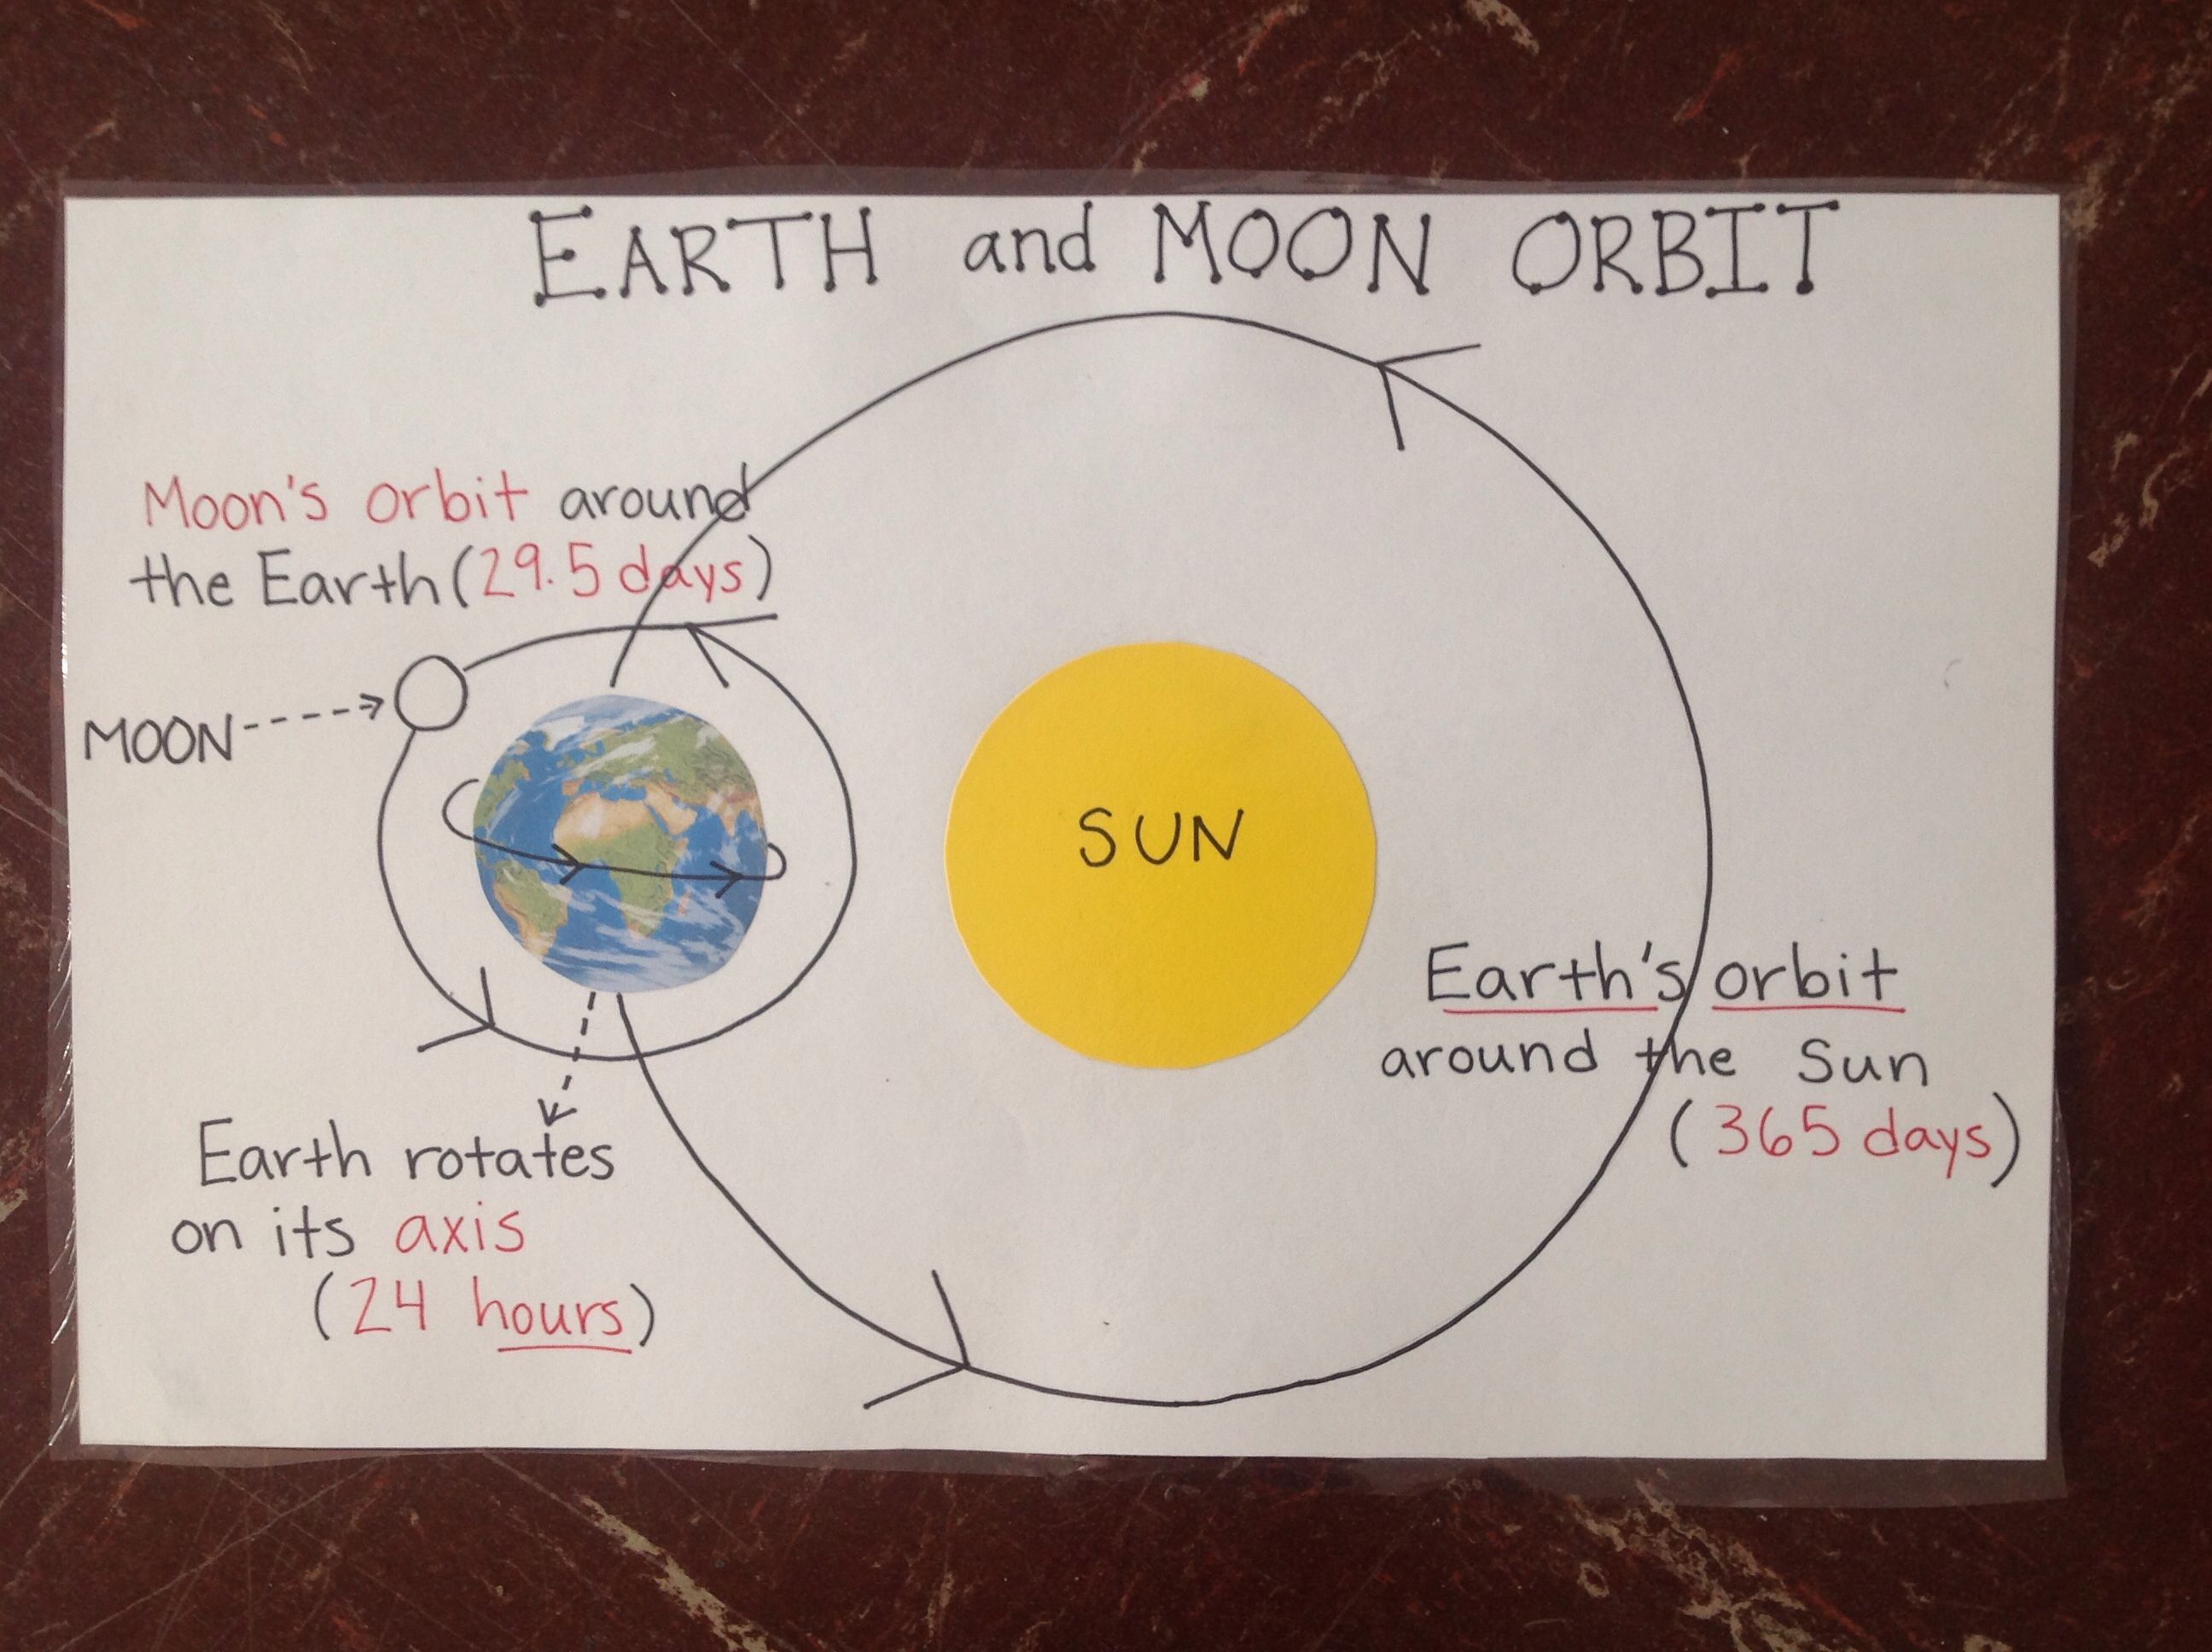 #anchor #earth #orbit #chart #moon #andEarth and moon ...